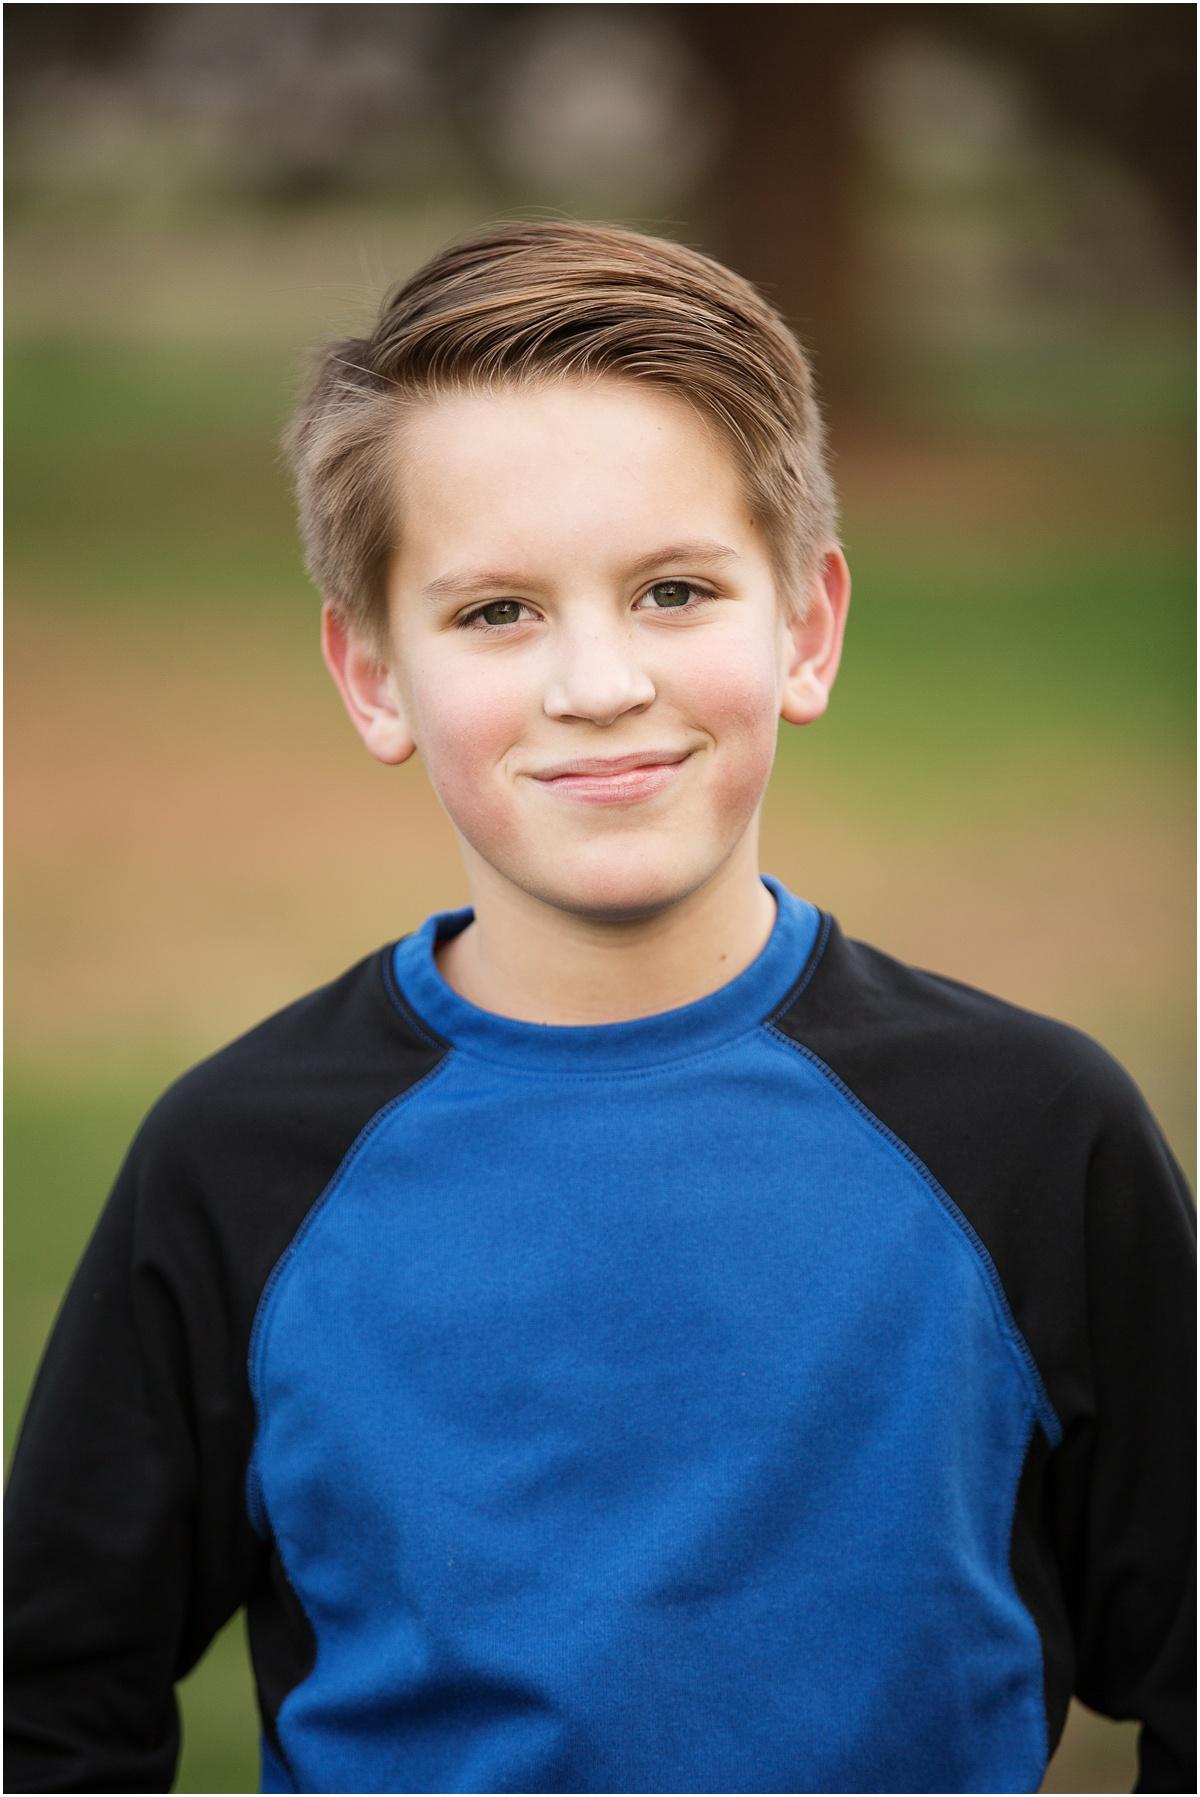 Portraits_Child Photography_Meridian Idaho__Leah Southwick Photography_0037.jpg